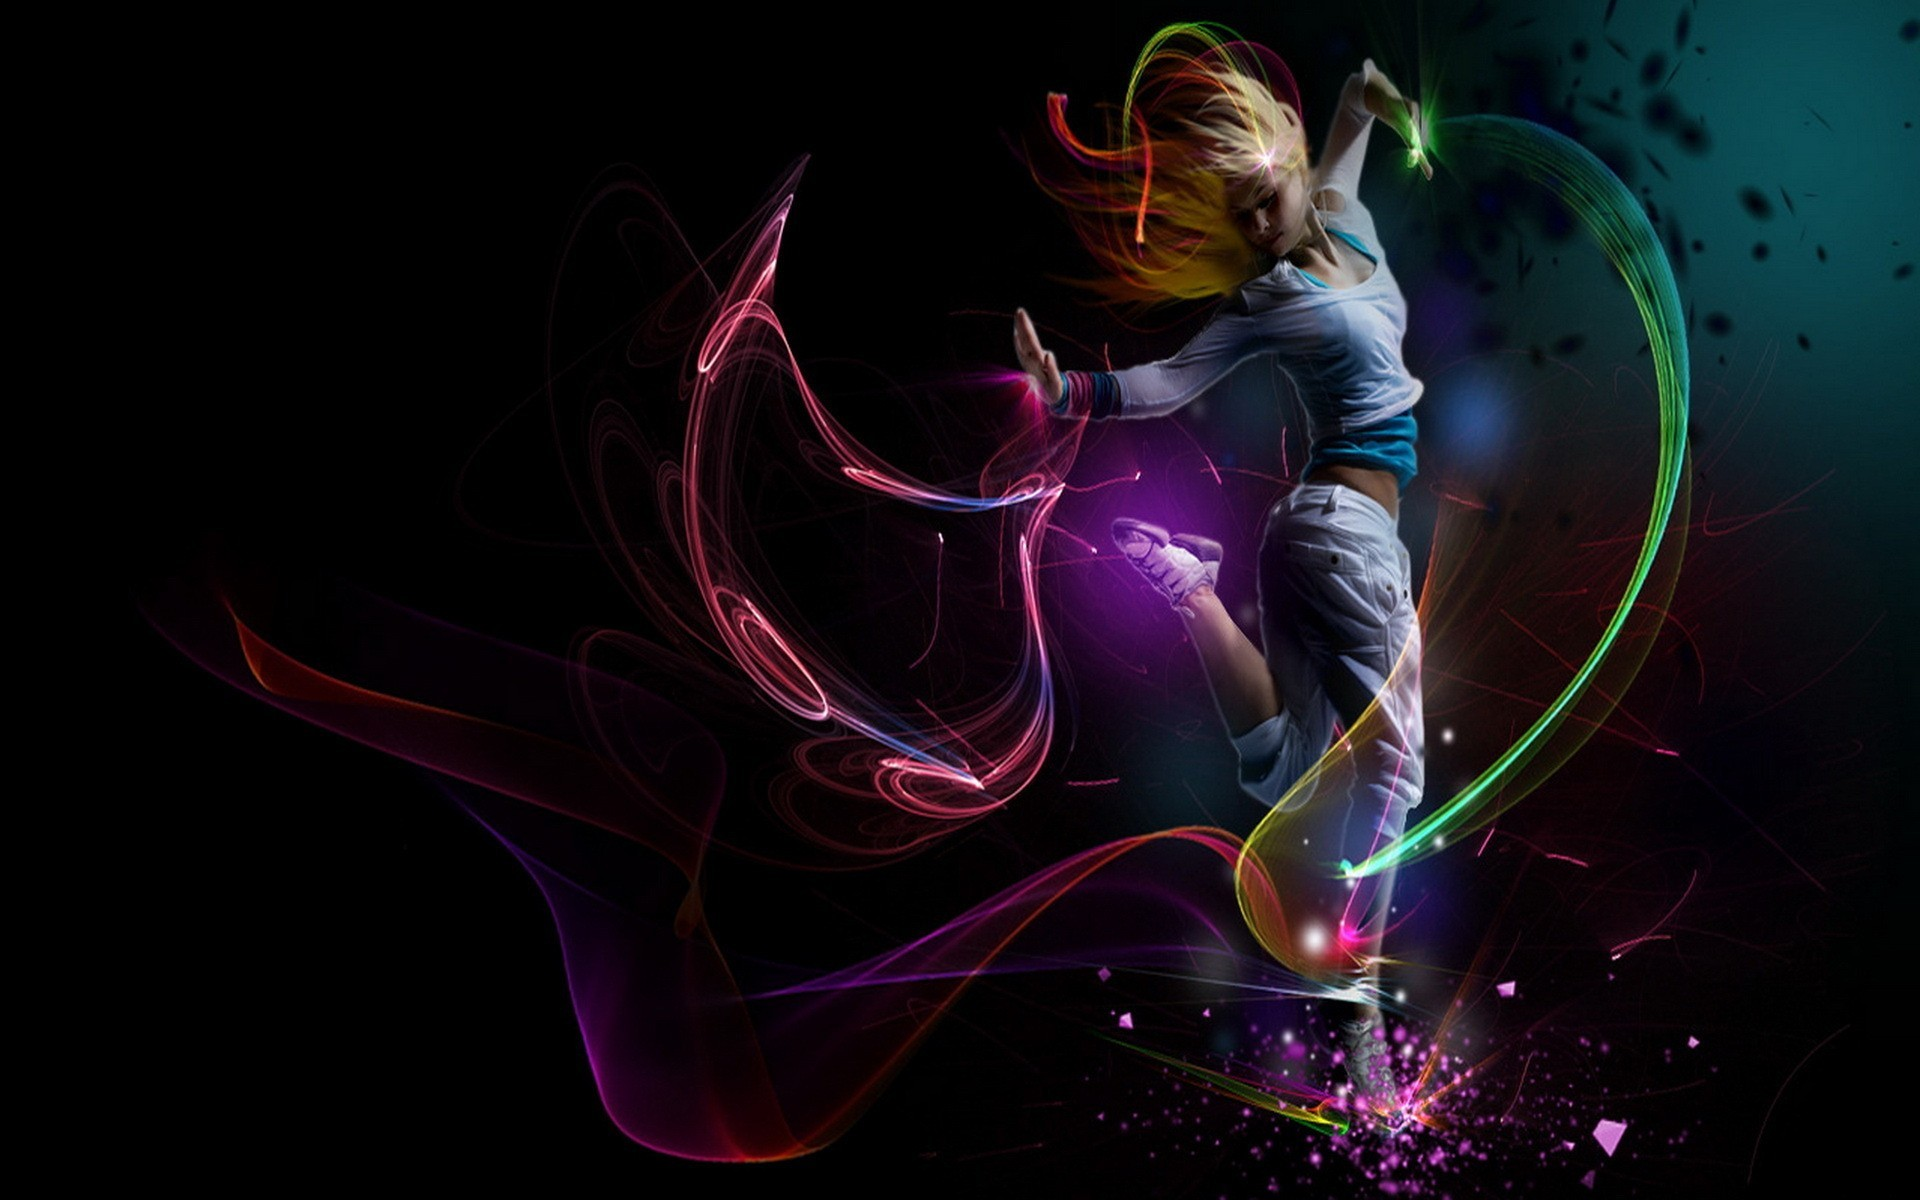 Dance Music Colored Black Wallpaper HD Desktop Mobile #4526729 Wallpaper